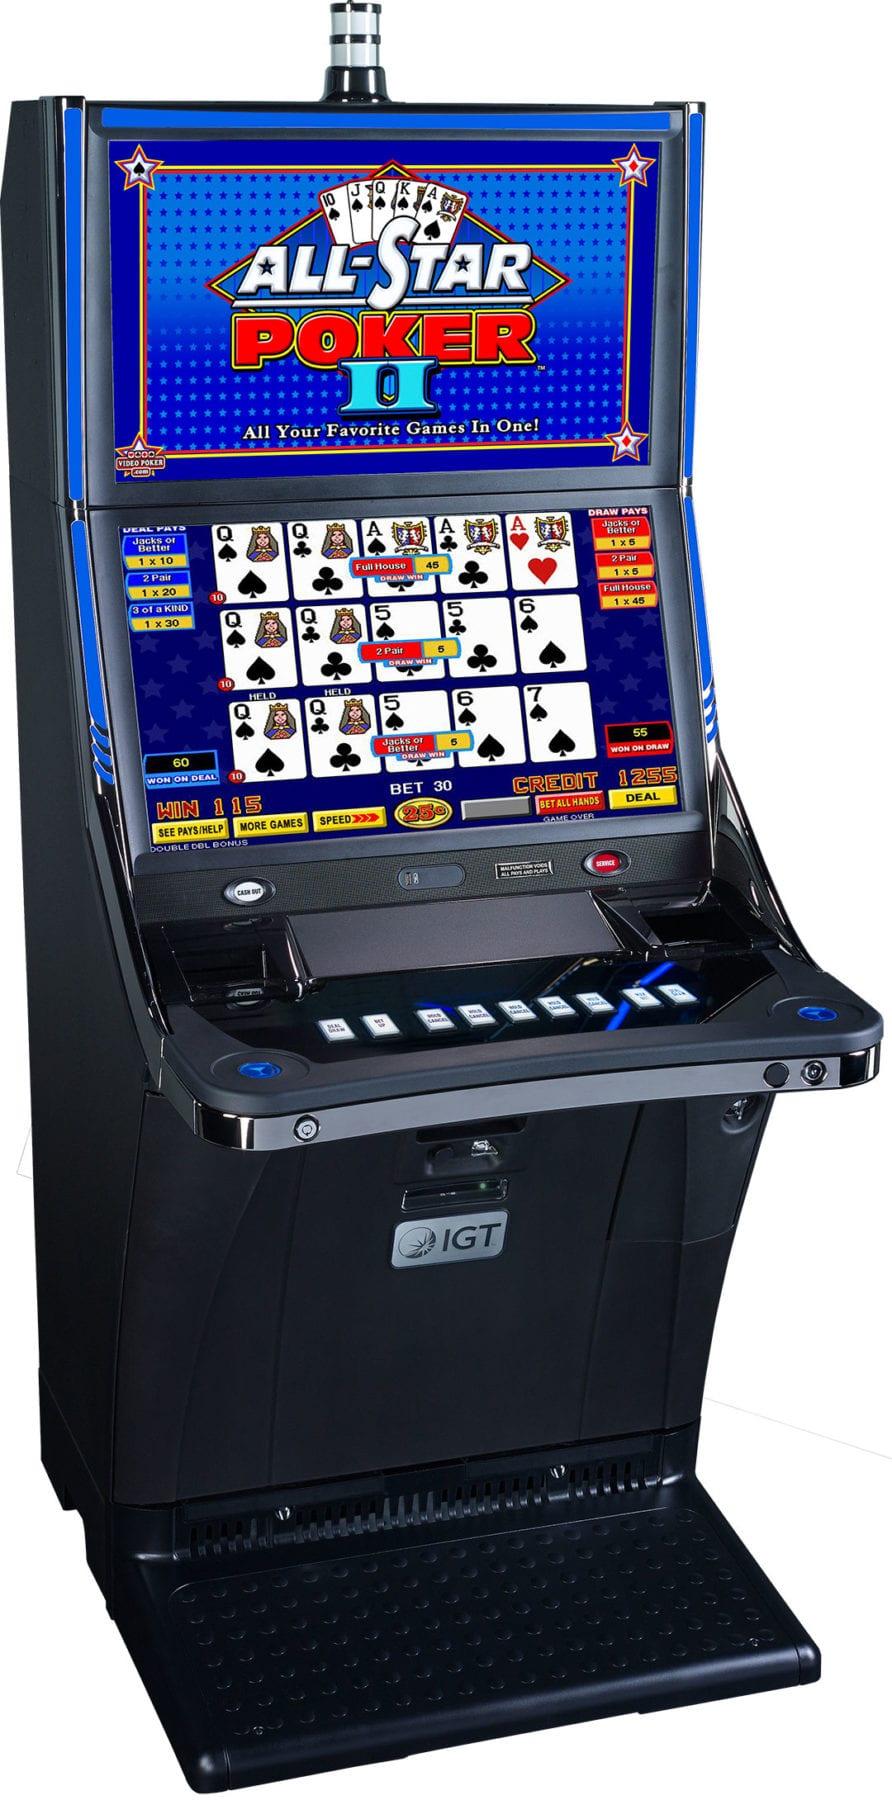 All Star Poker Crystal Slant Cabinet